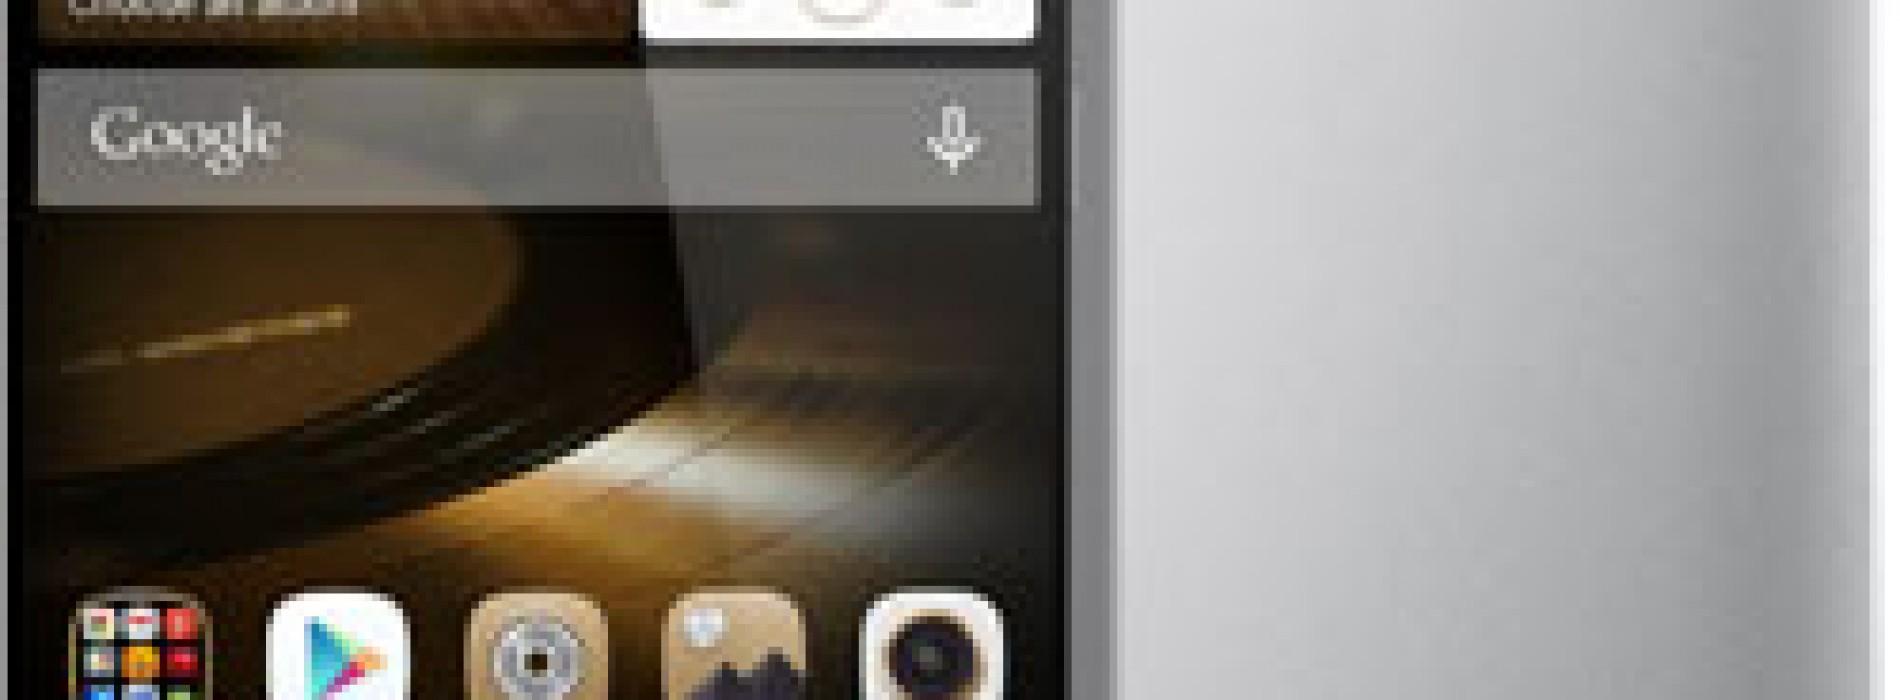 Ascend Mate7 tecnología superior de huella digital de un solo toque